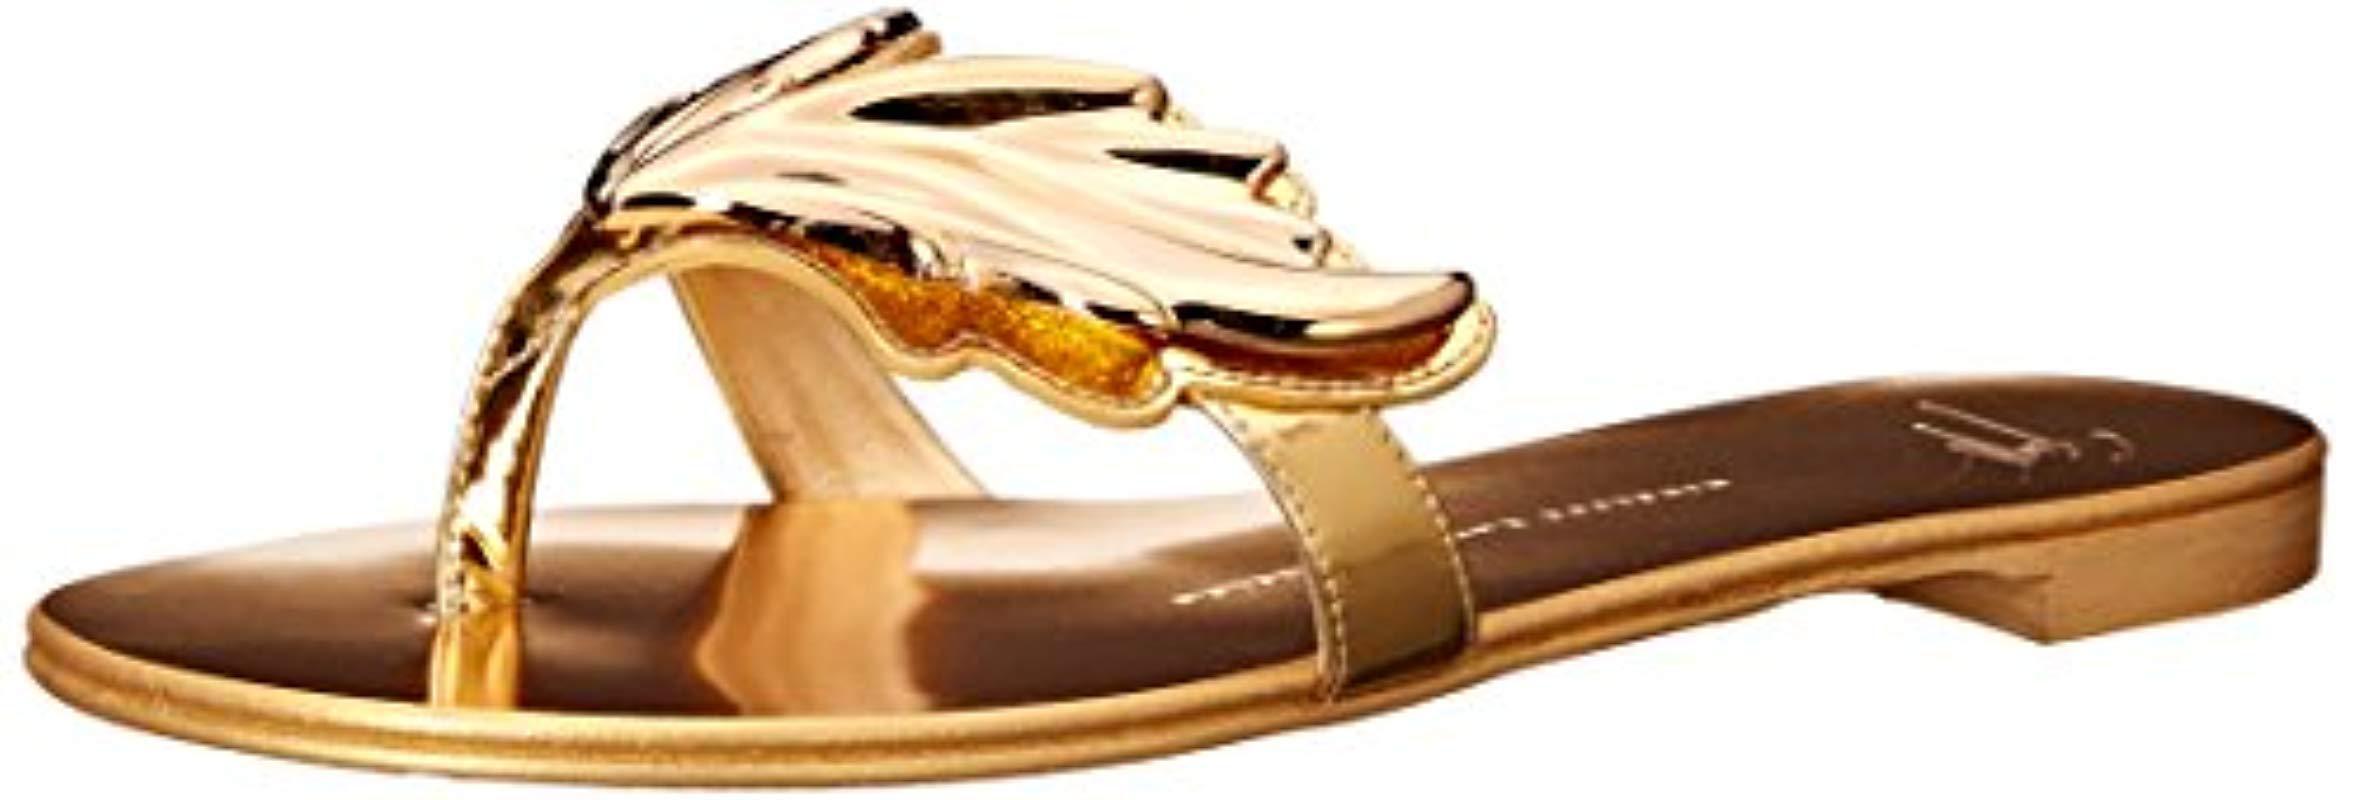 f4757f504d9a7 Lyst - Giuseppe Zanotti E60287 Dress Sandal